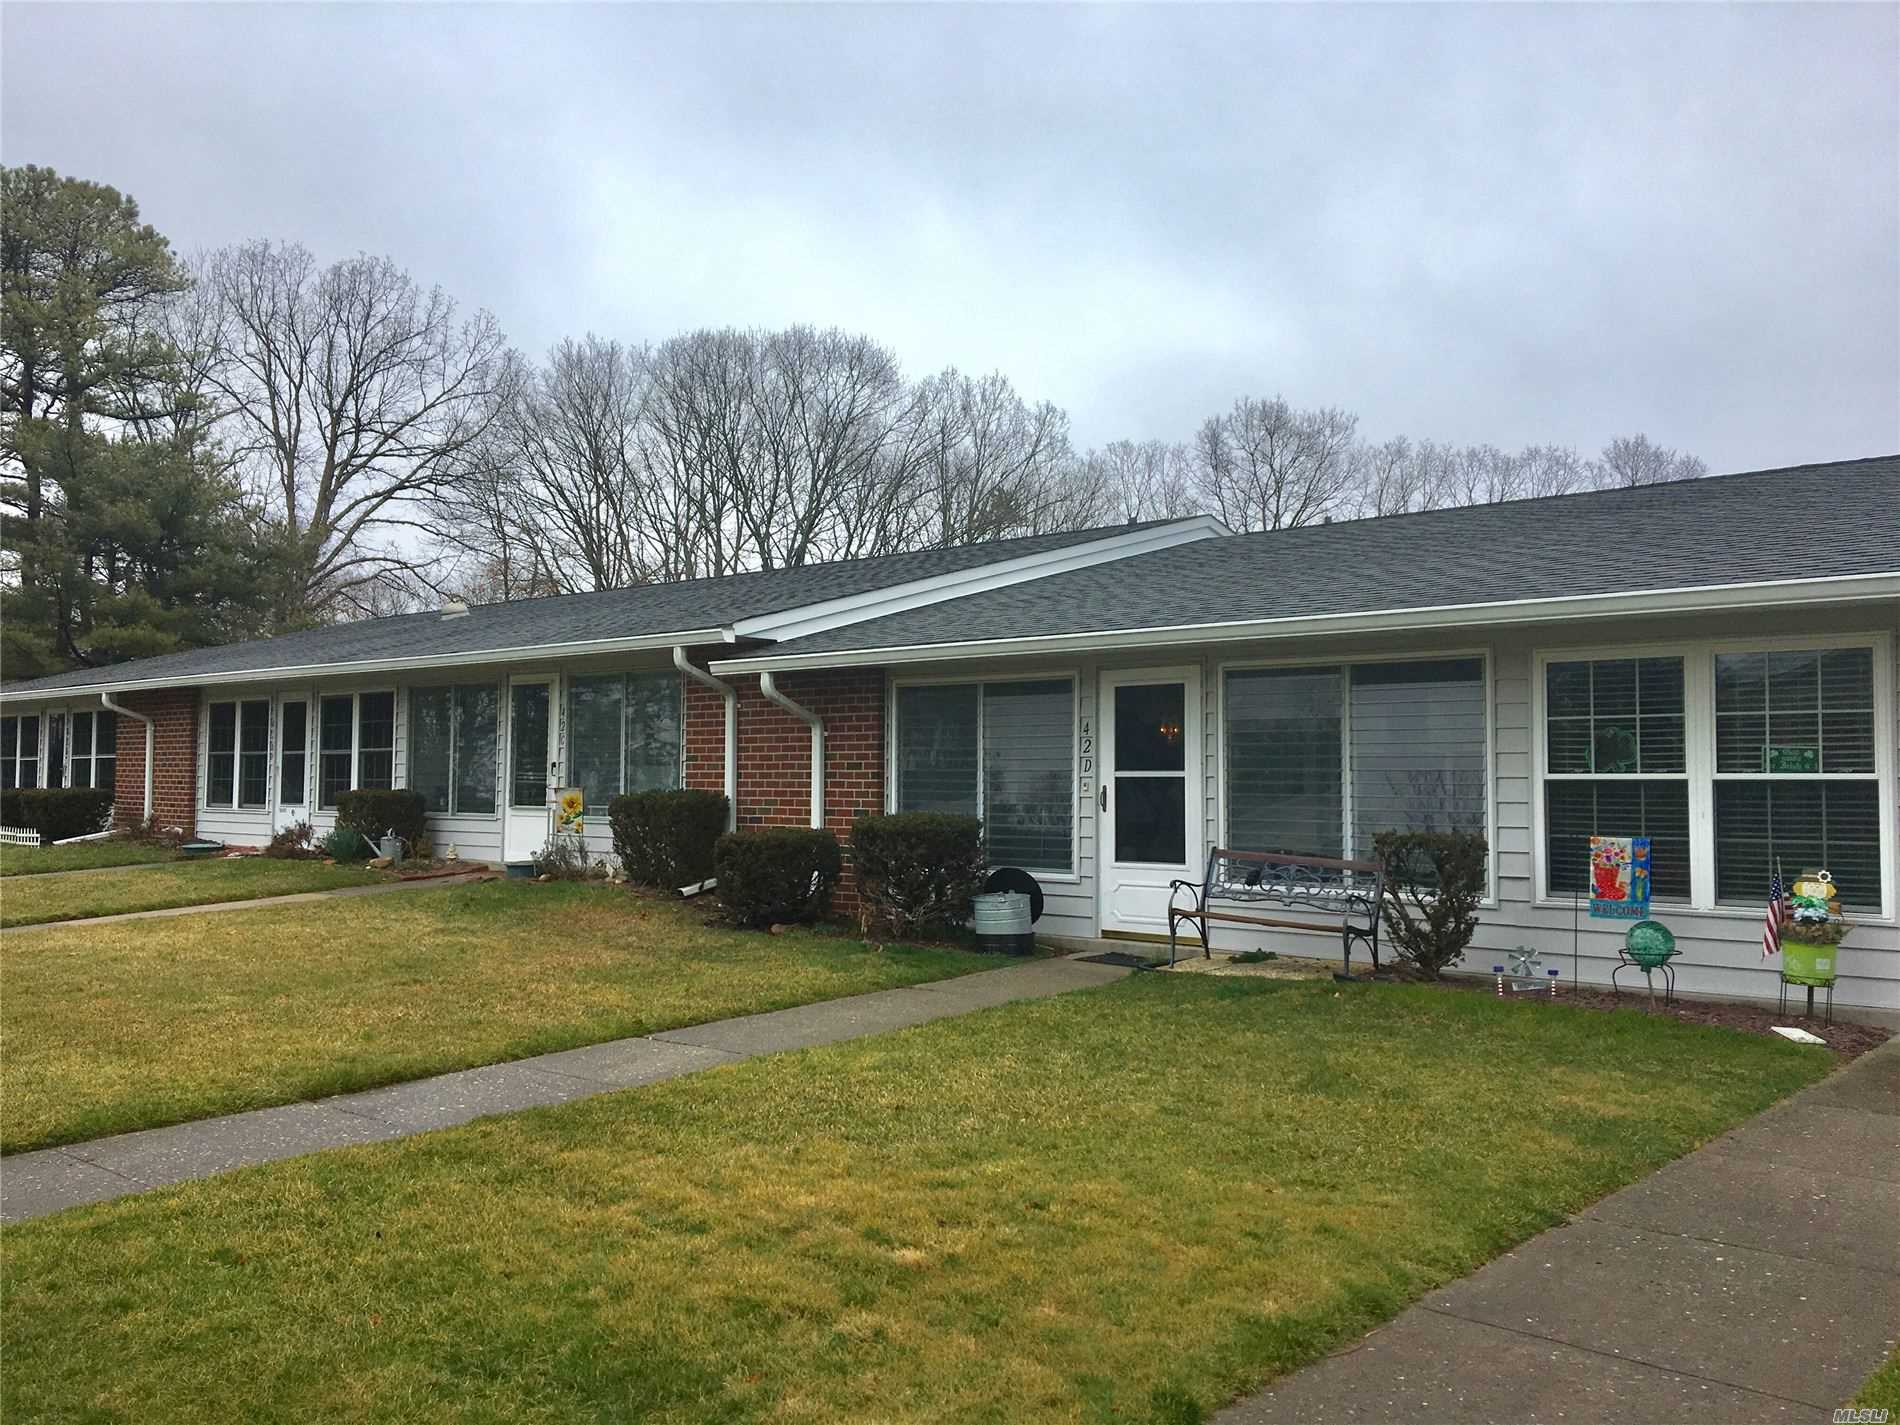 Property for sale at 42 D Trent Court, Ridge NY 11961, Ridge,  New York 11961